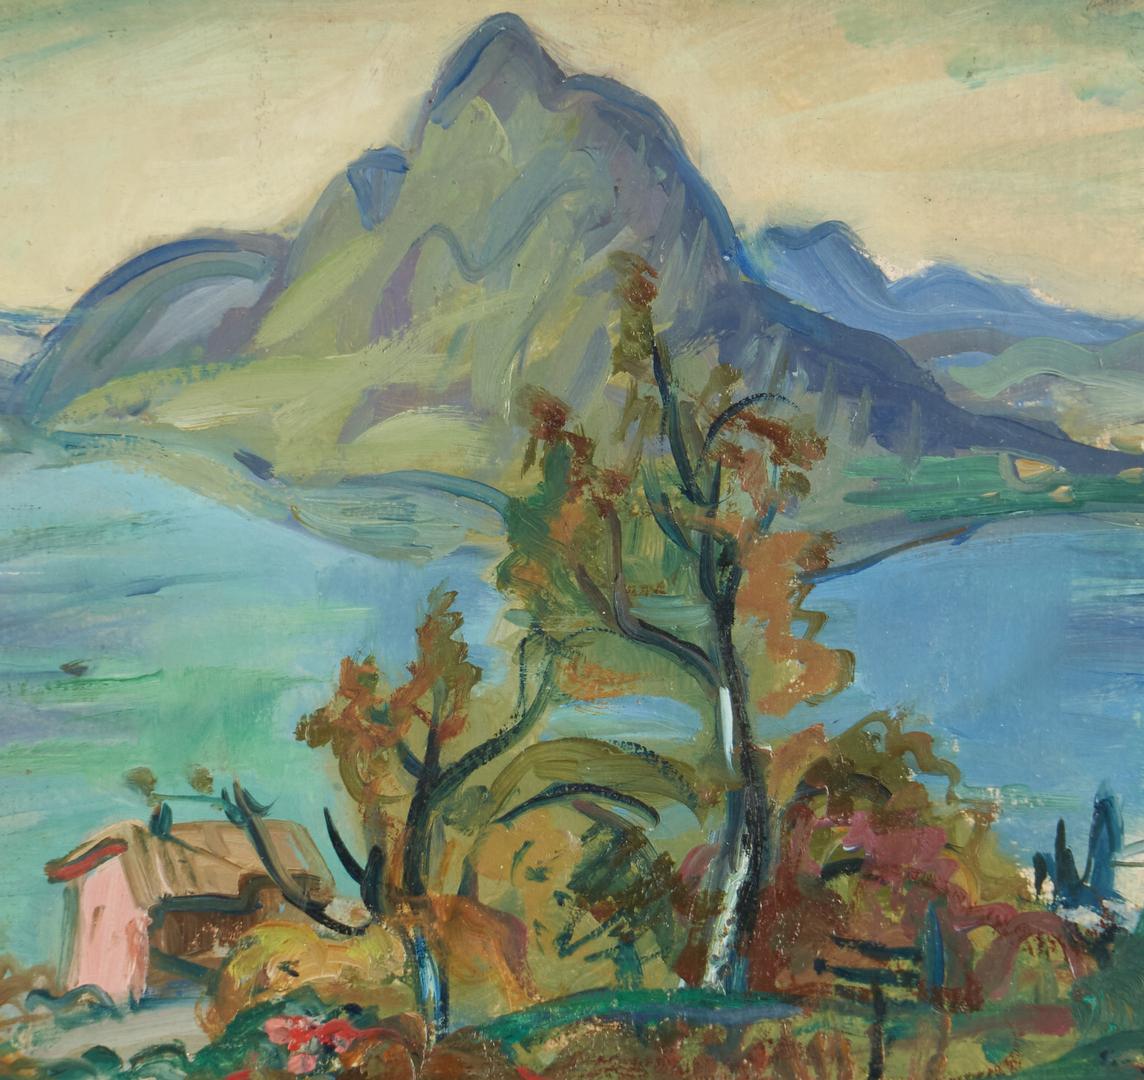 Lot 902: Fauvist Landscape, manner of Charles Camoin, plus Greg Carter giclee landscape